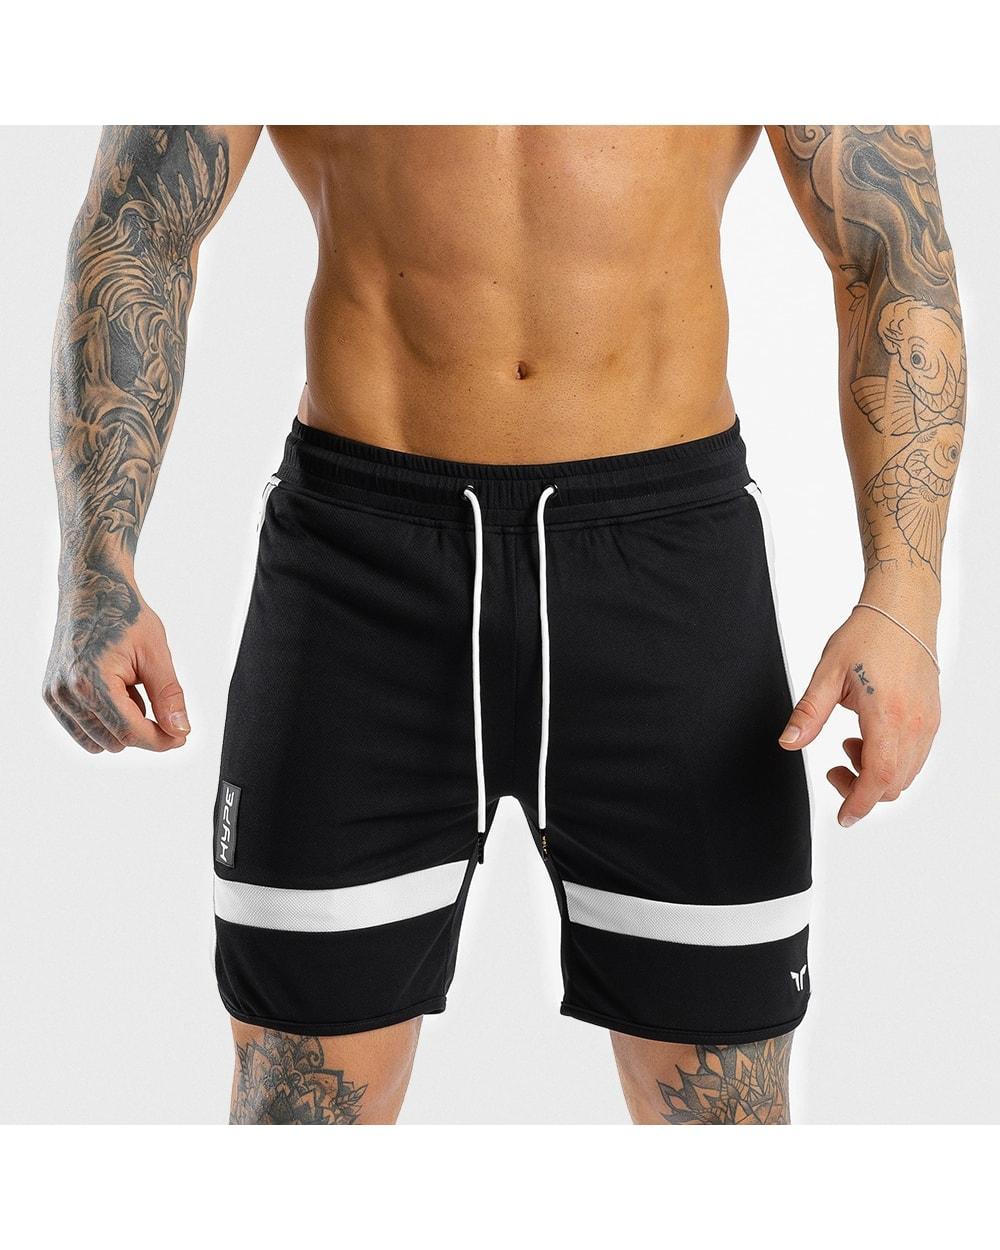 squat_wolf_hype_panel_shorts4